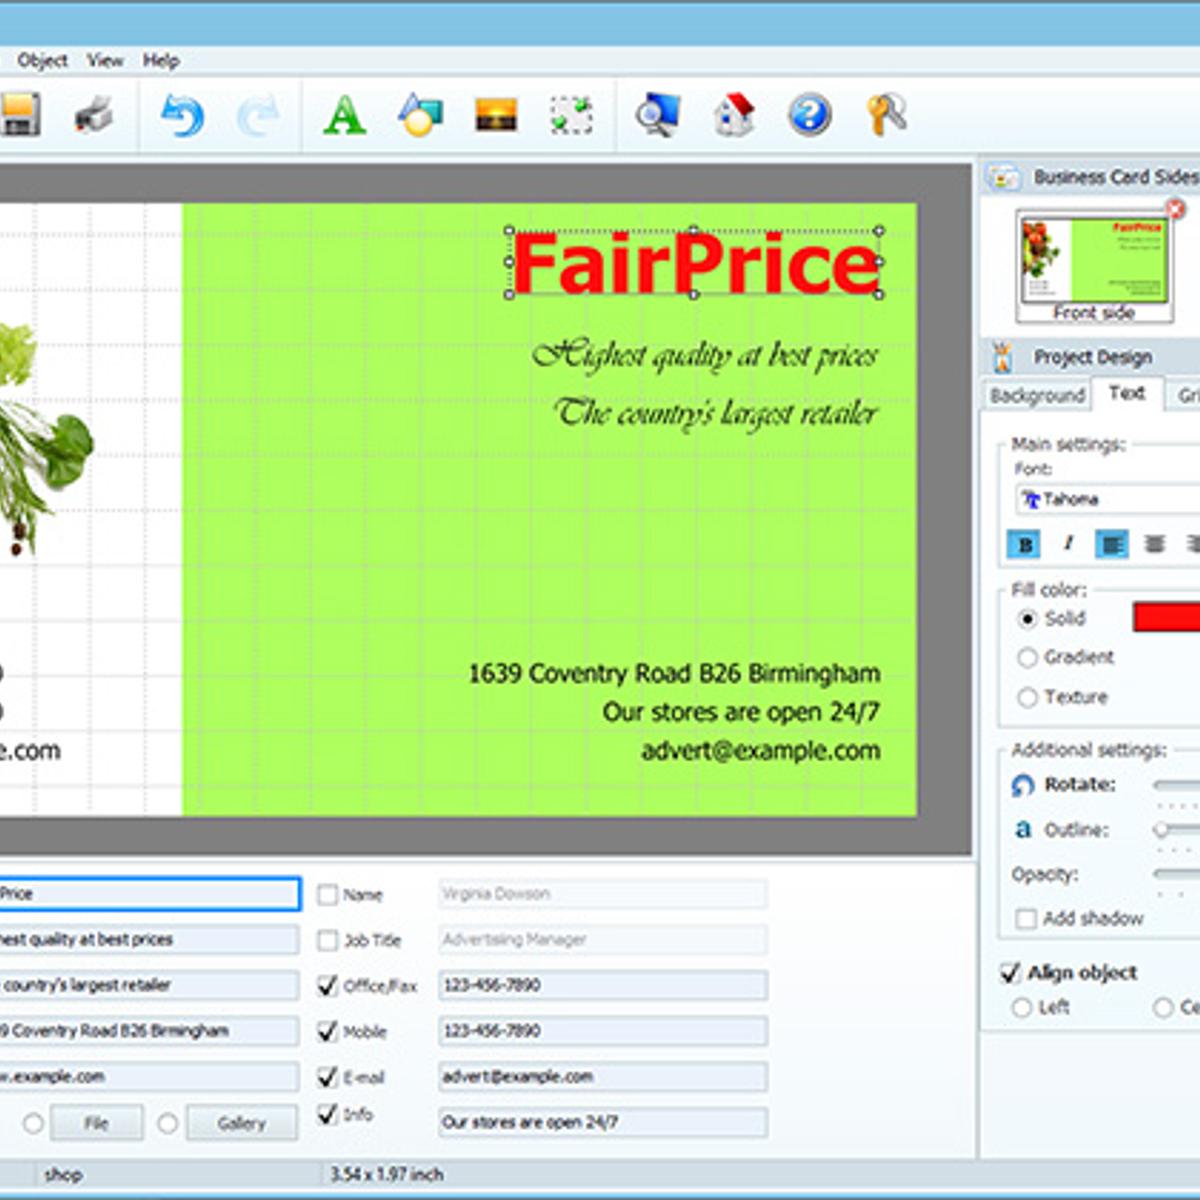 Business Card Maker Alternatives and Similar Software